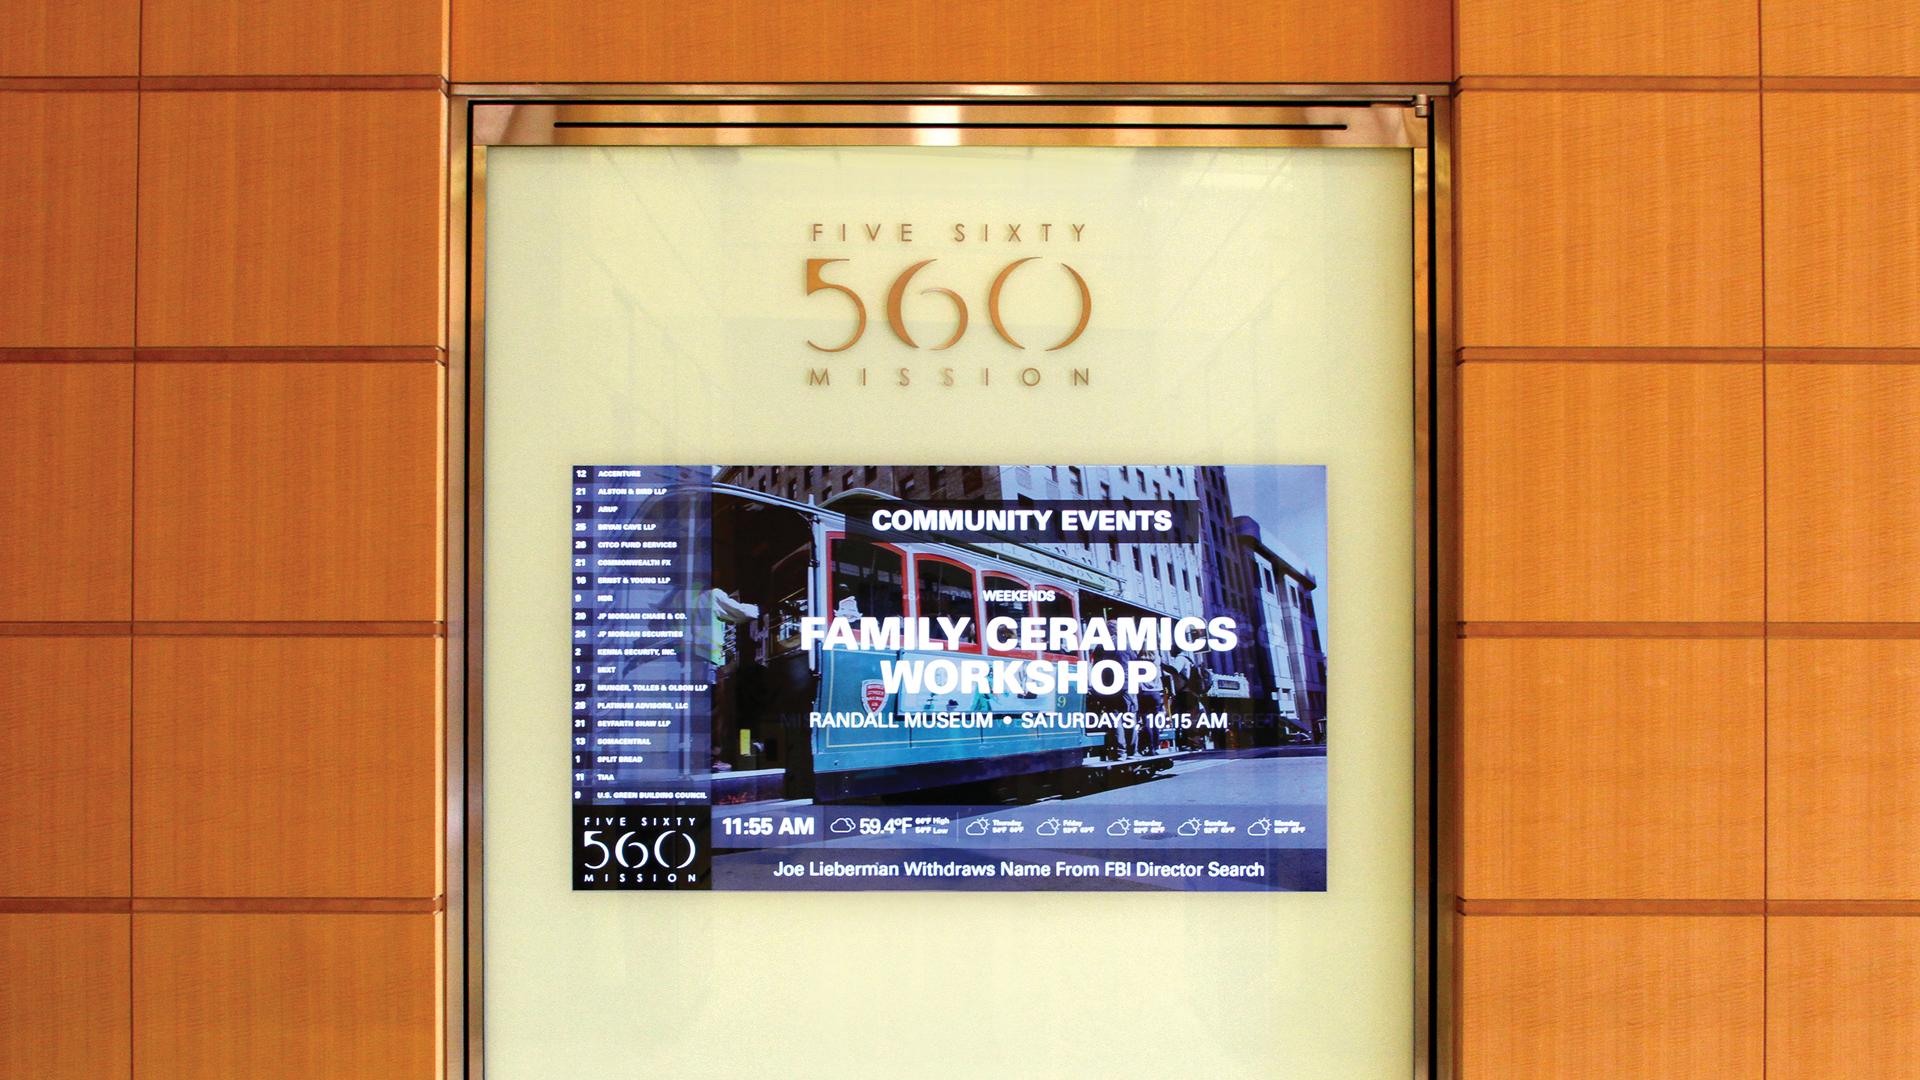 560 Mission 5.jpg